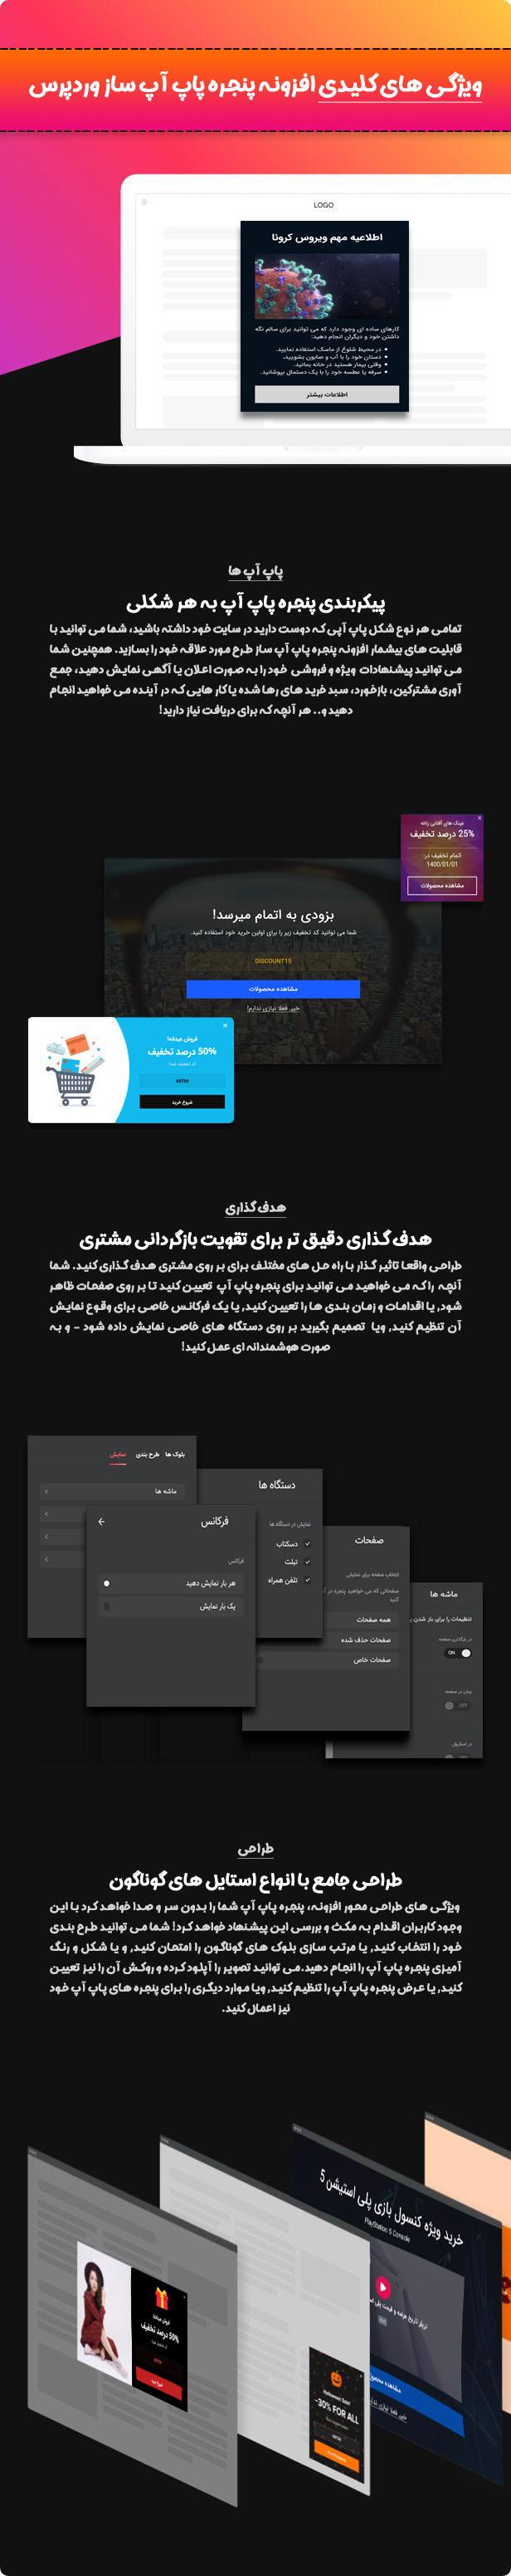 افزونه پنجره پاپ آپ ساز وردپرس - Popup Maker 2